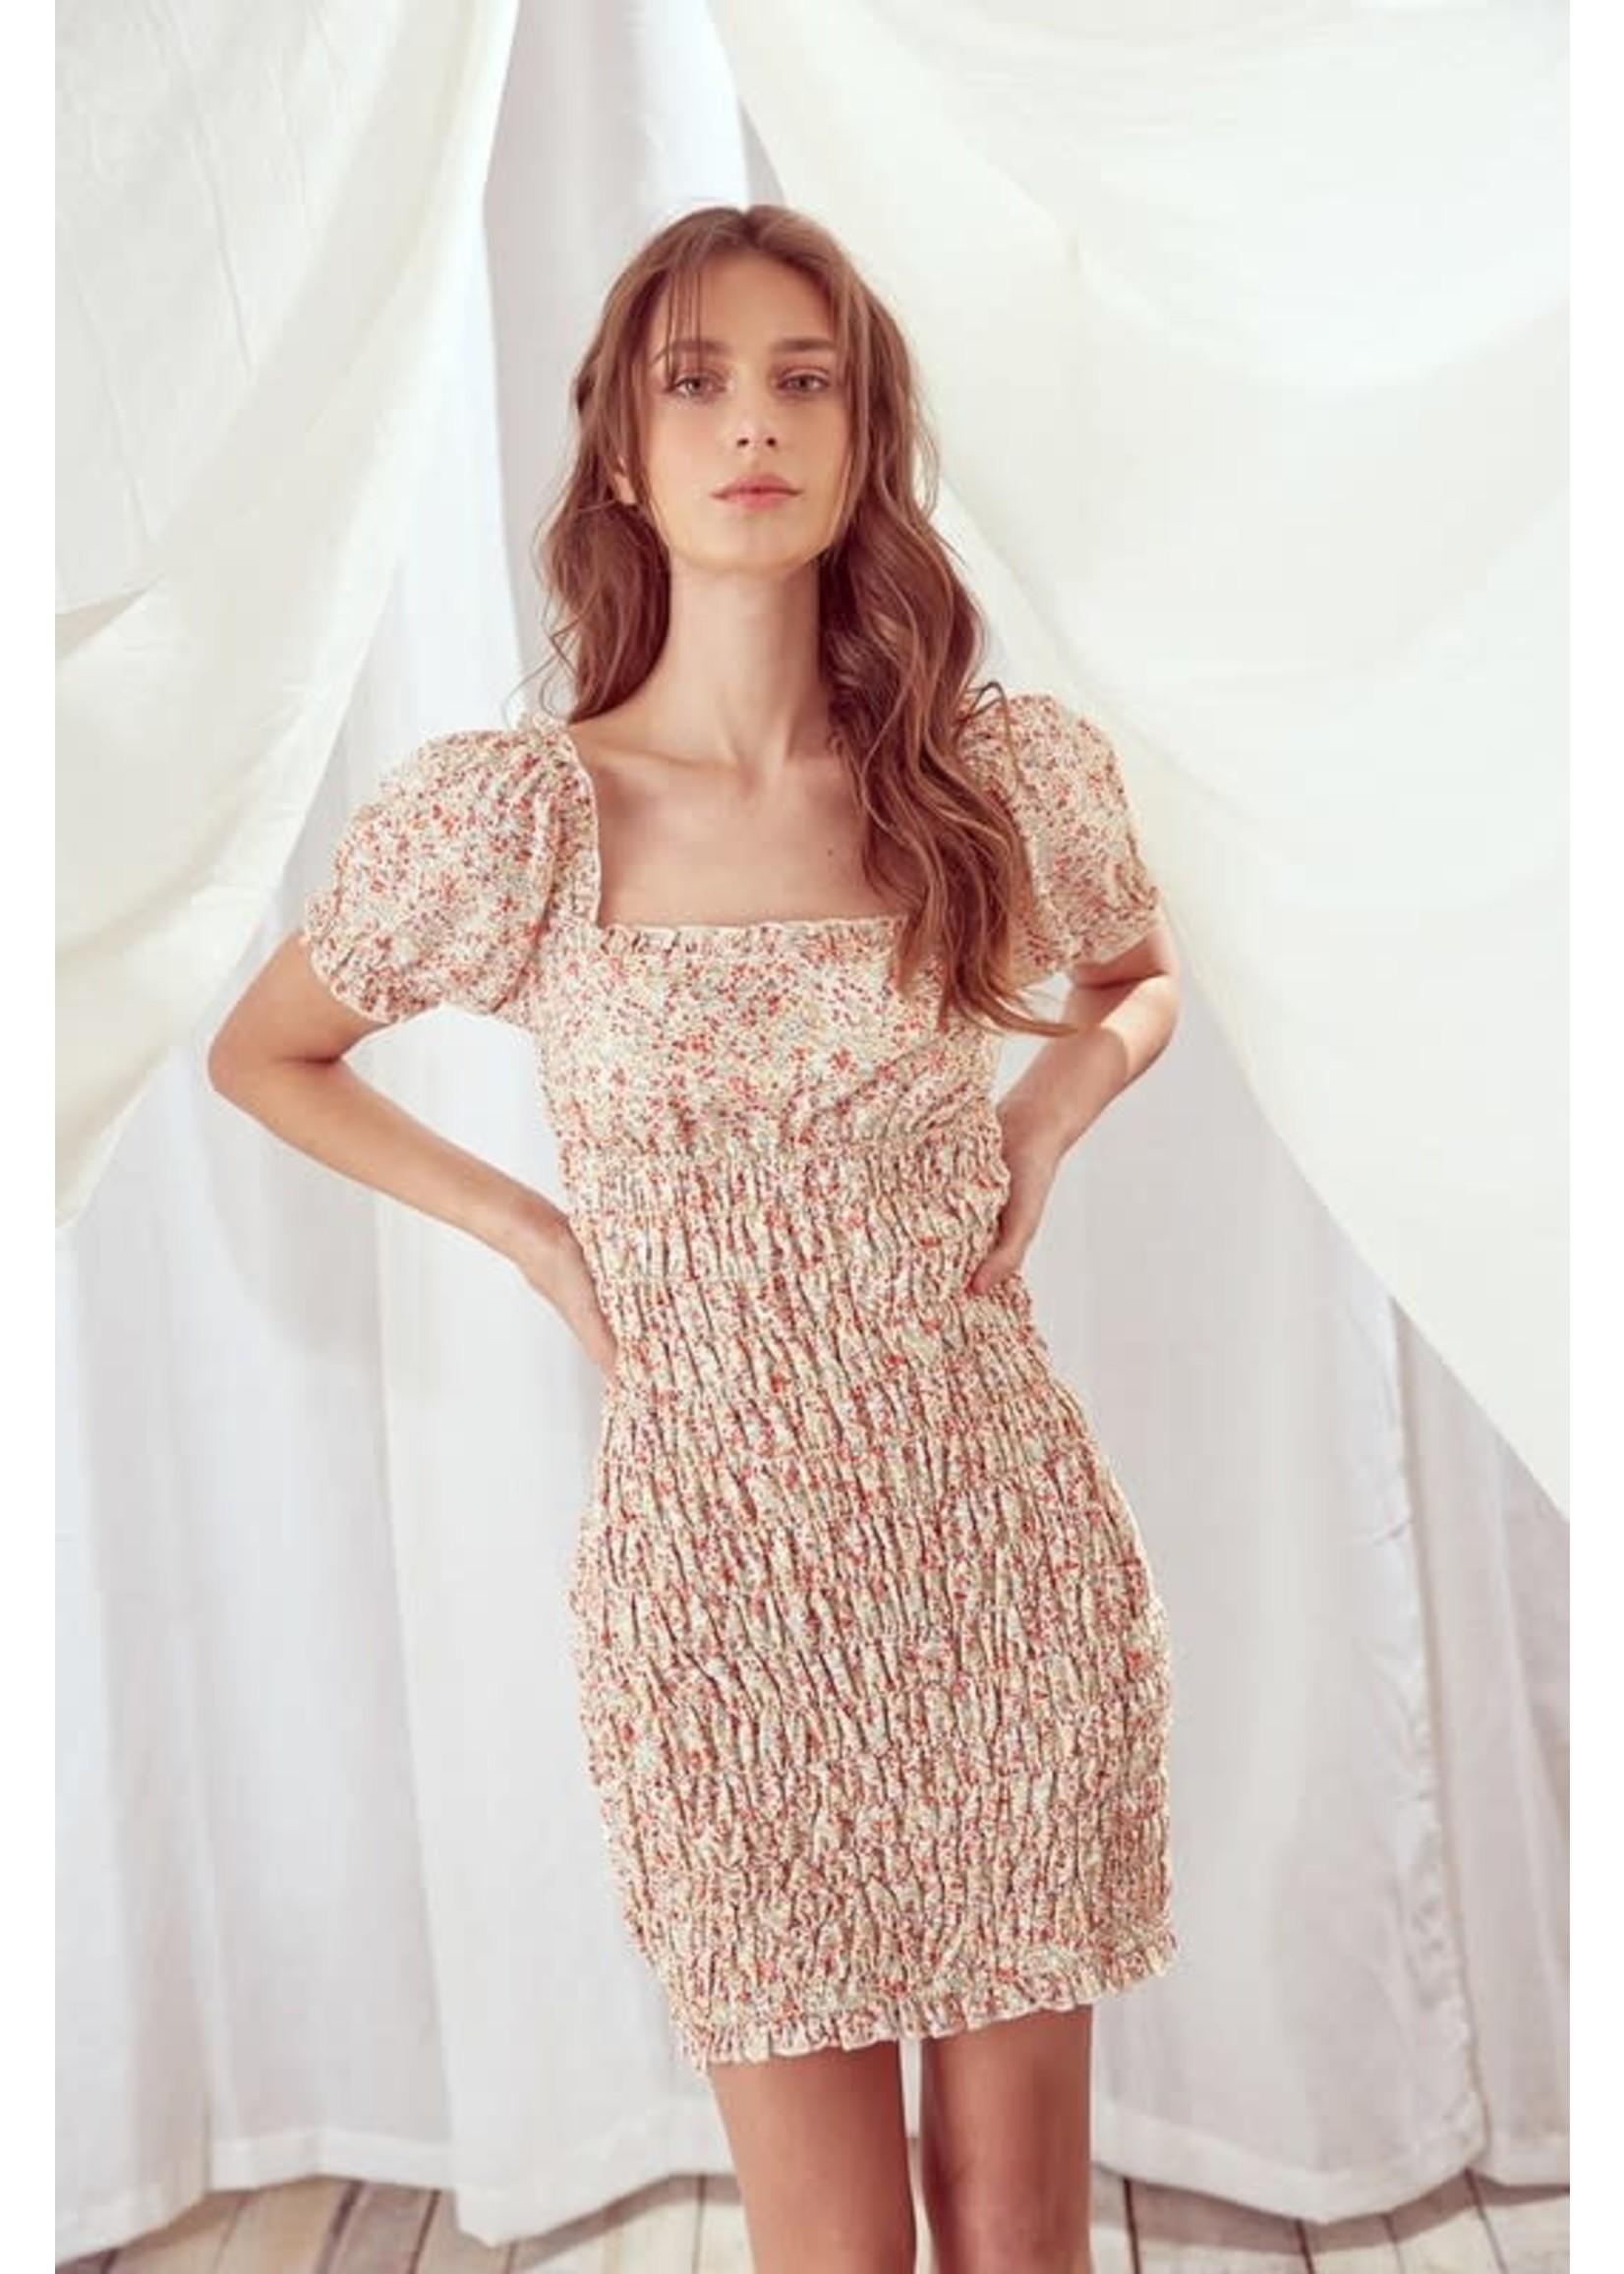 Storia Floral Smocked Mini Dress - BD2174